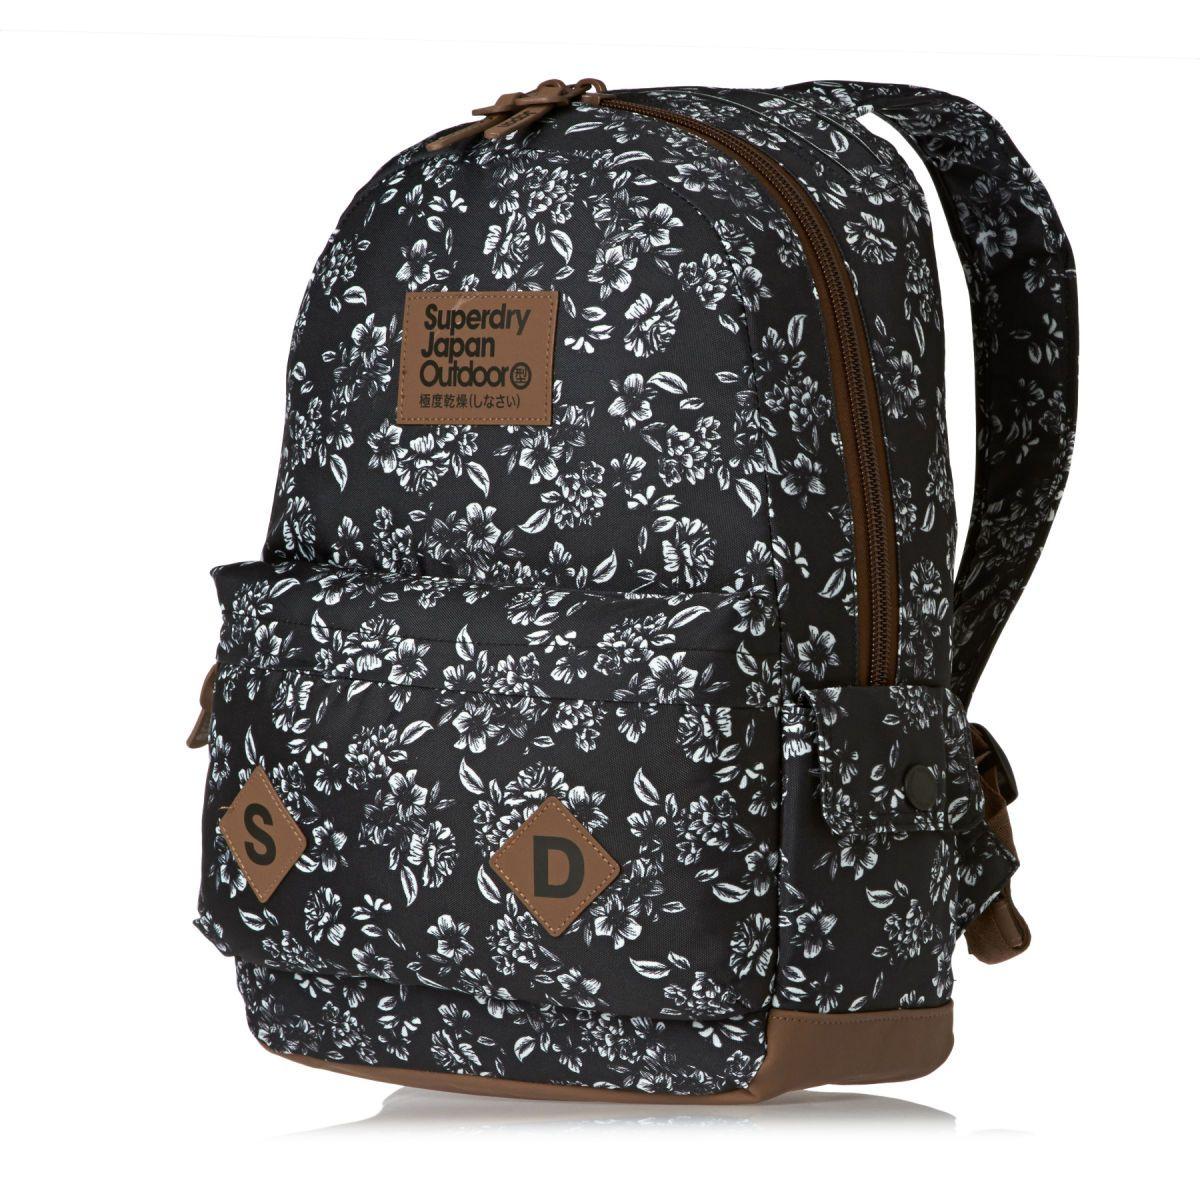 Superdry Freja Montana Backpack - Black Floral | Superdry ... : superdry quilted rucksack - Adamdwight.com